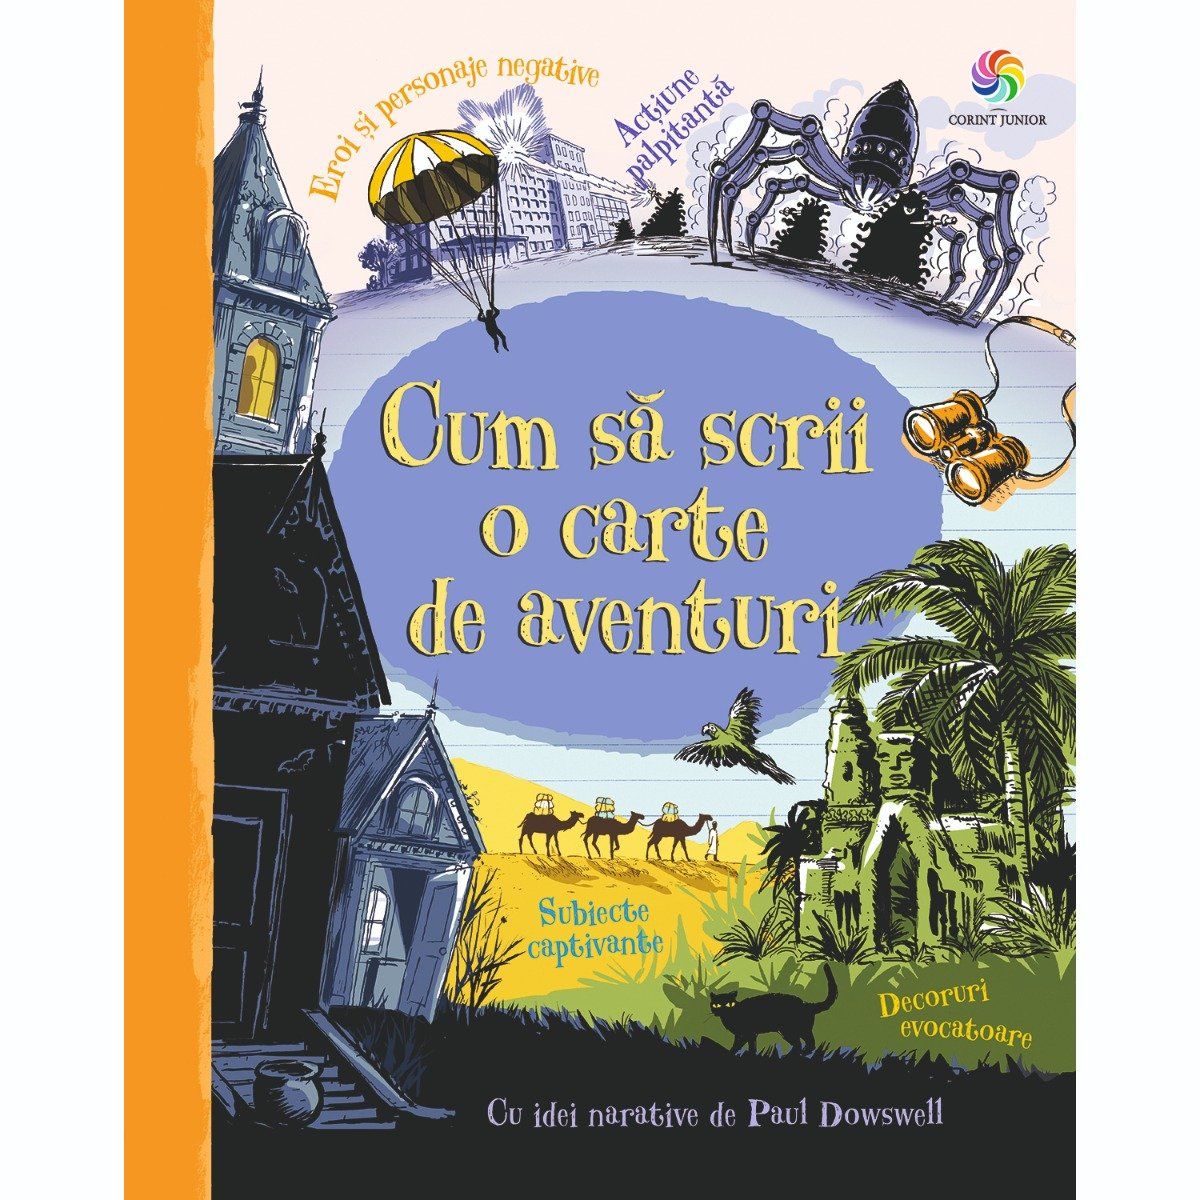 Carte Editura Corint, Cum sa scrii o carte de aventuri, Paul Dowswell